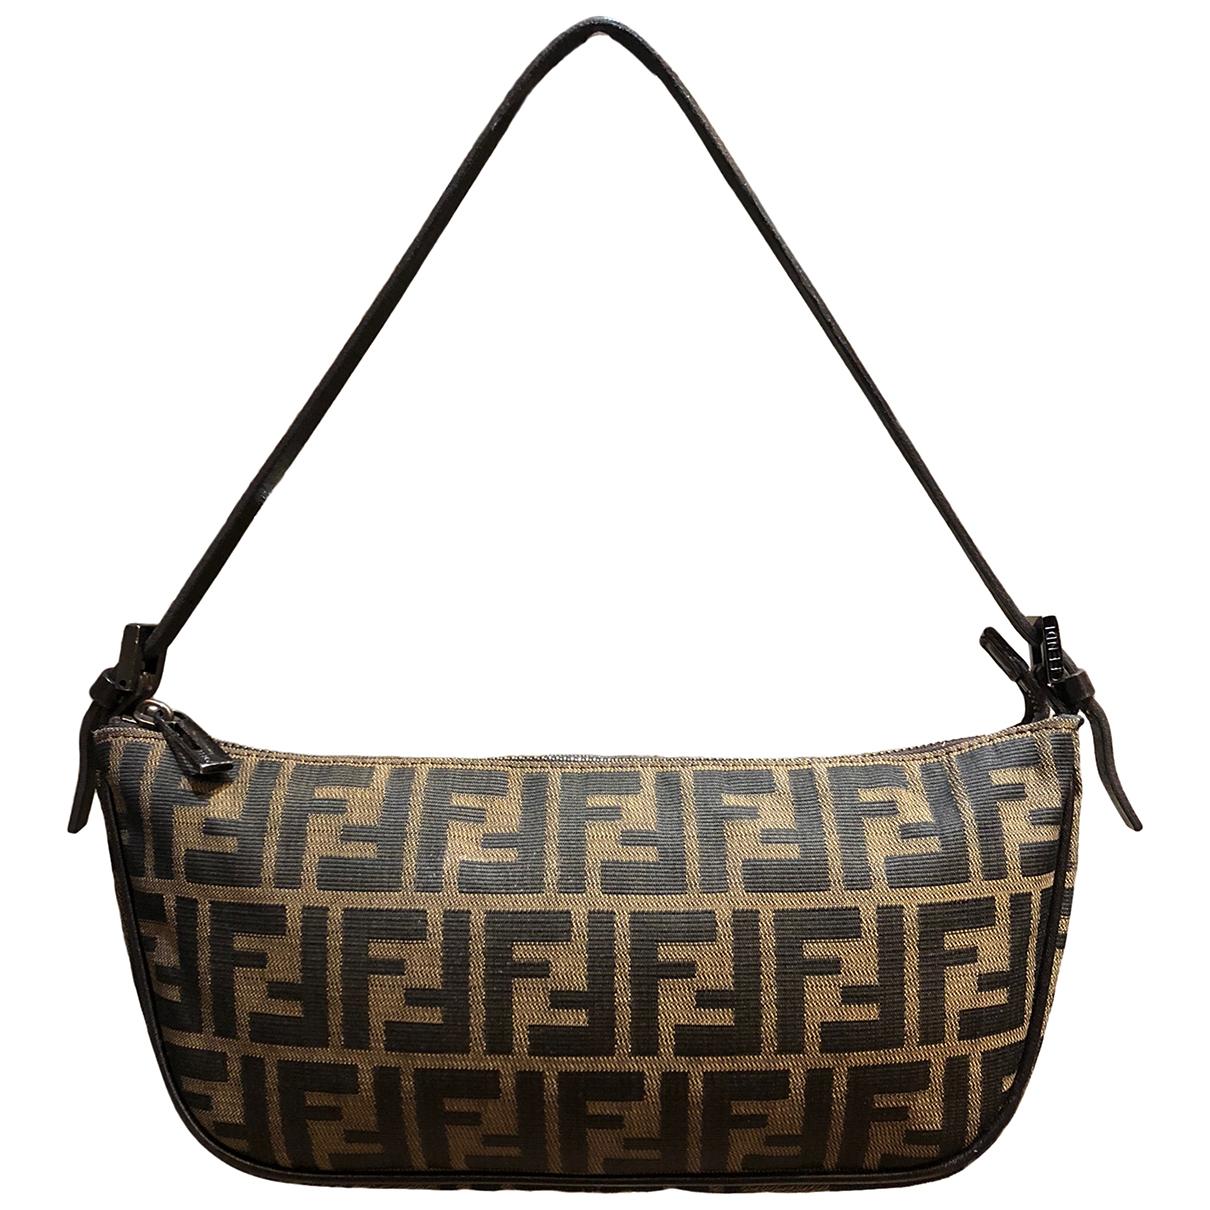 Fendi \N Cloth Clutch bag for Women \N